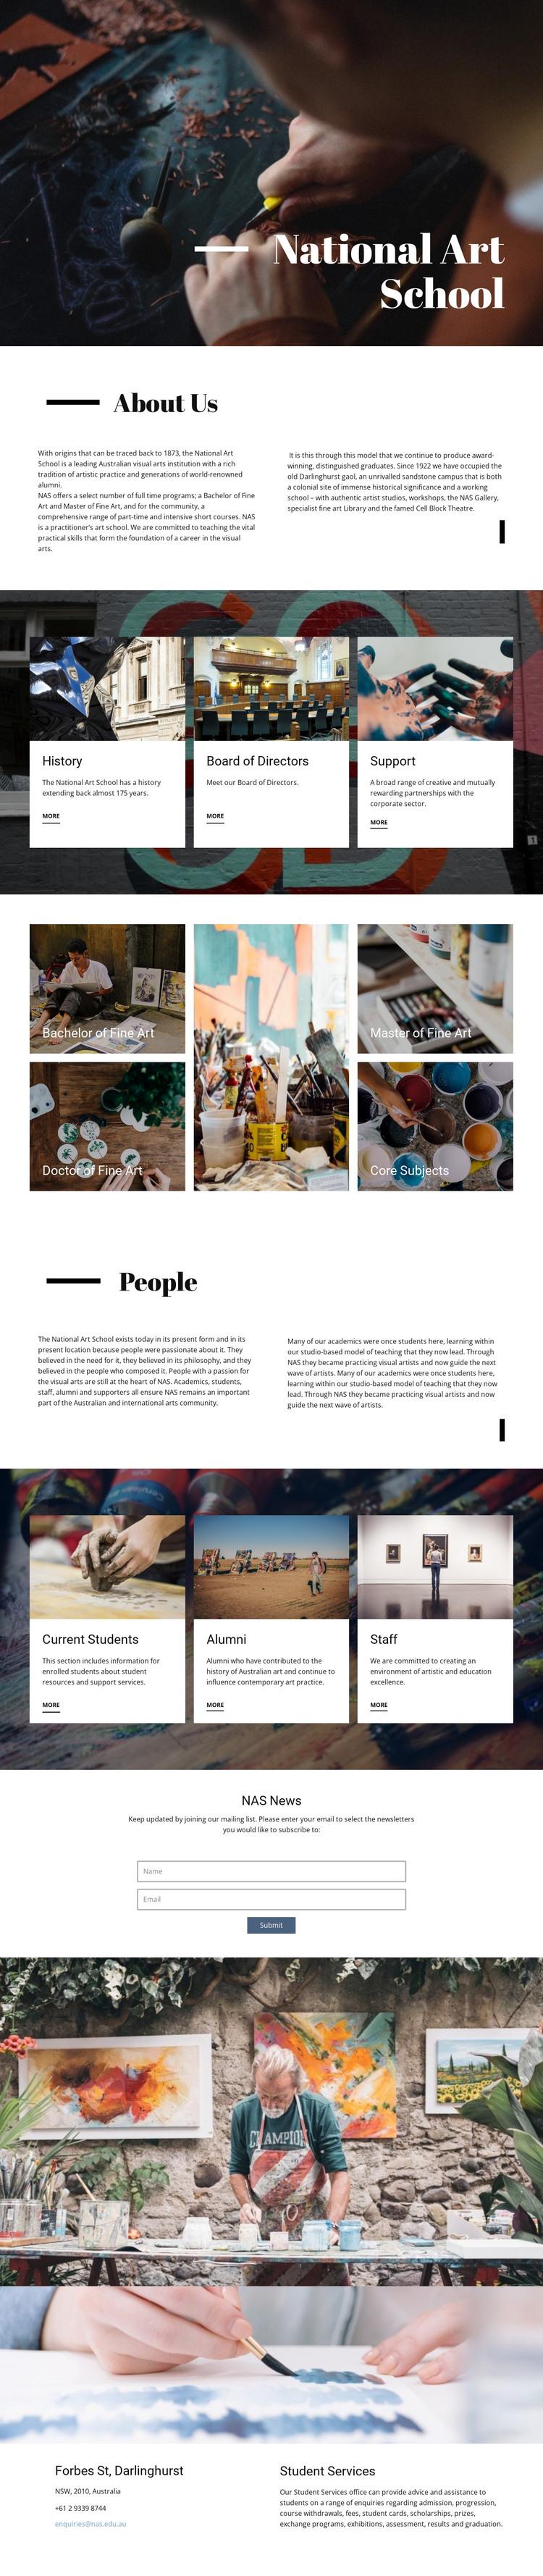 National art school Web Design